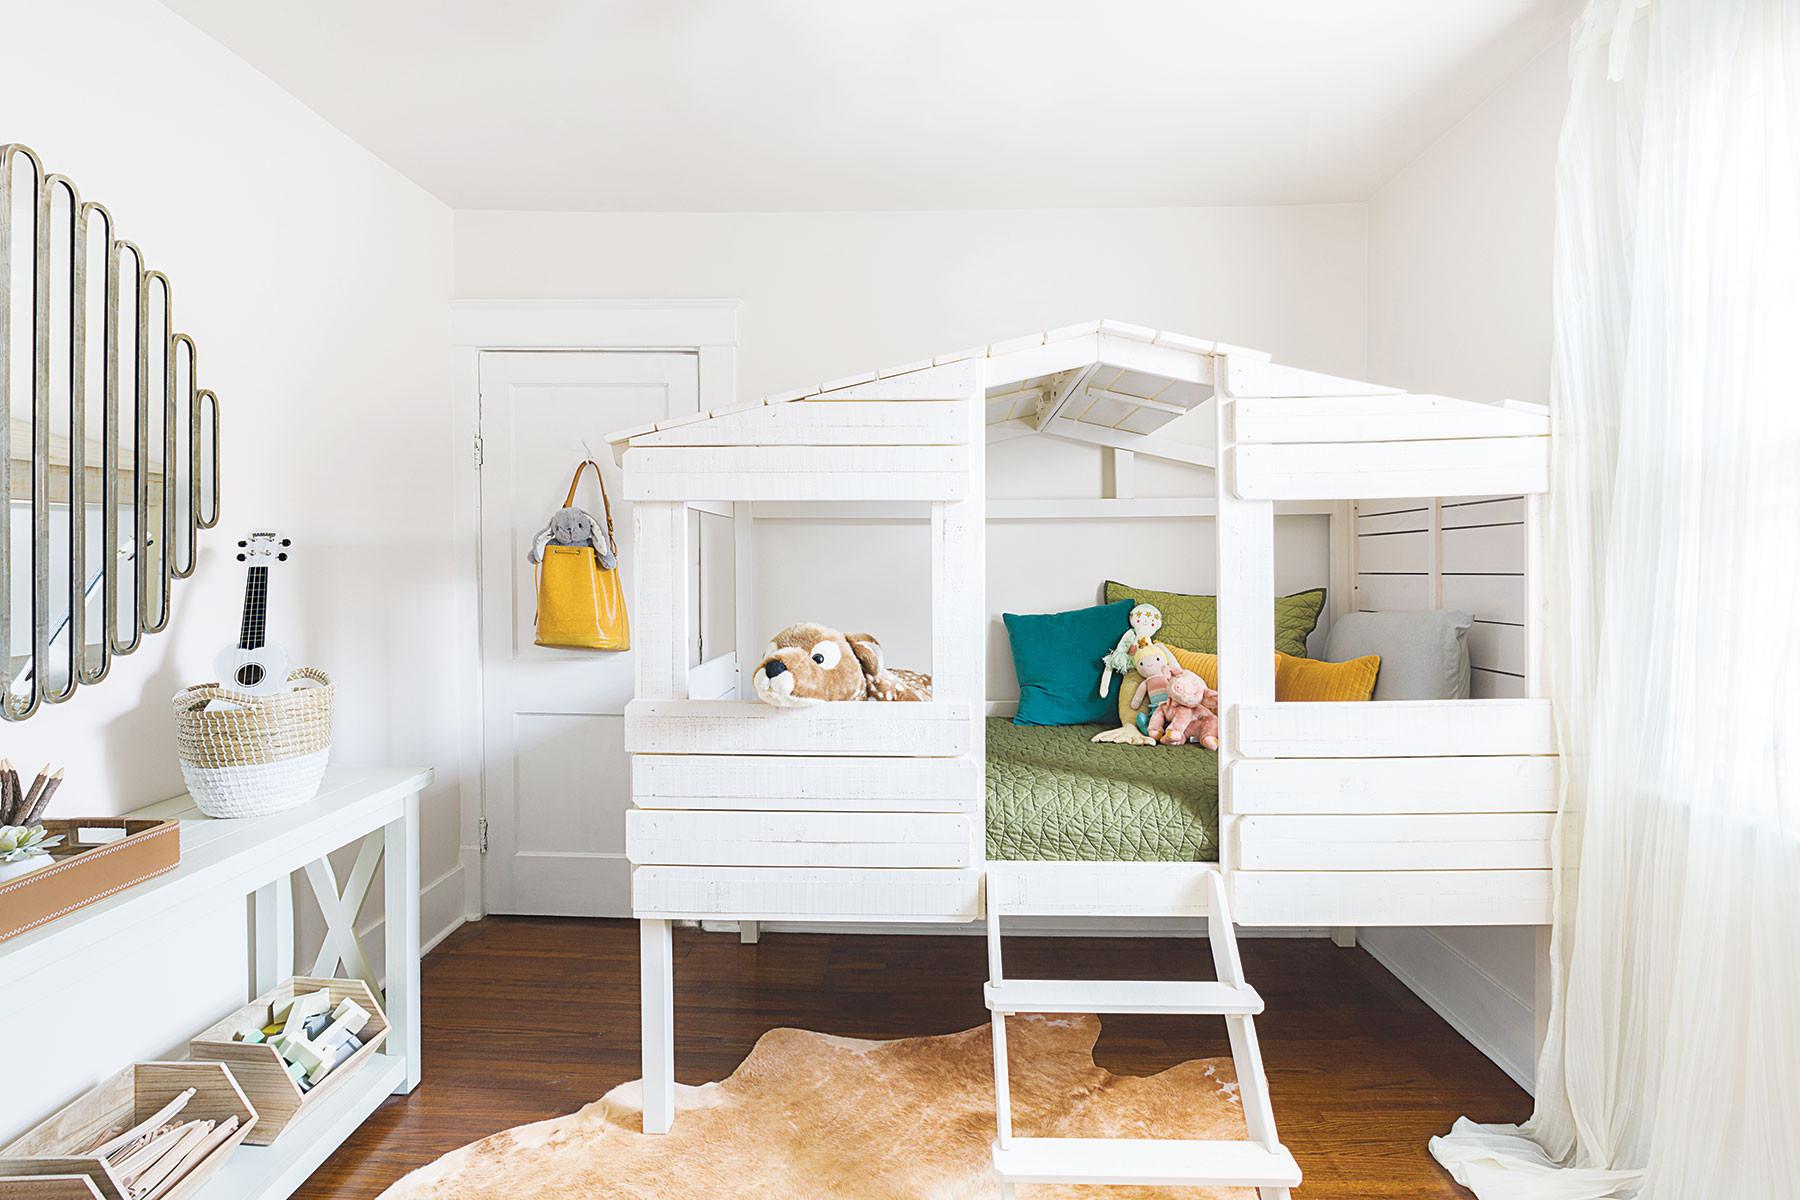 Kids Room Decor Ideas  17 DIY Kids Room Decor Ideas Your Dream es True – Top